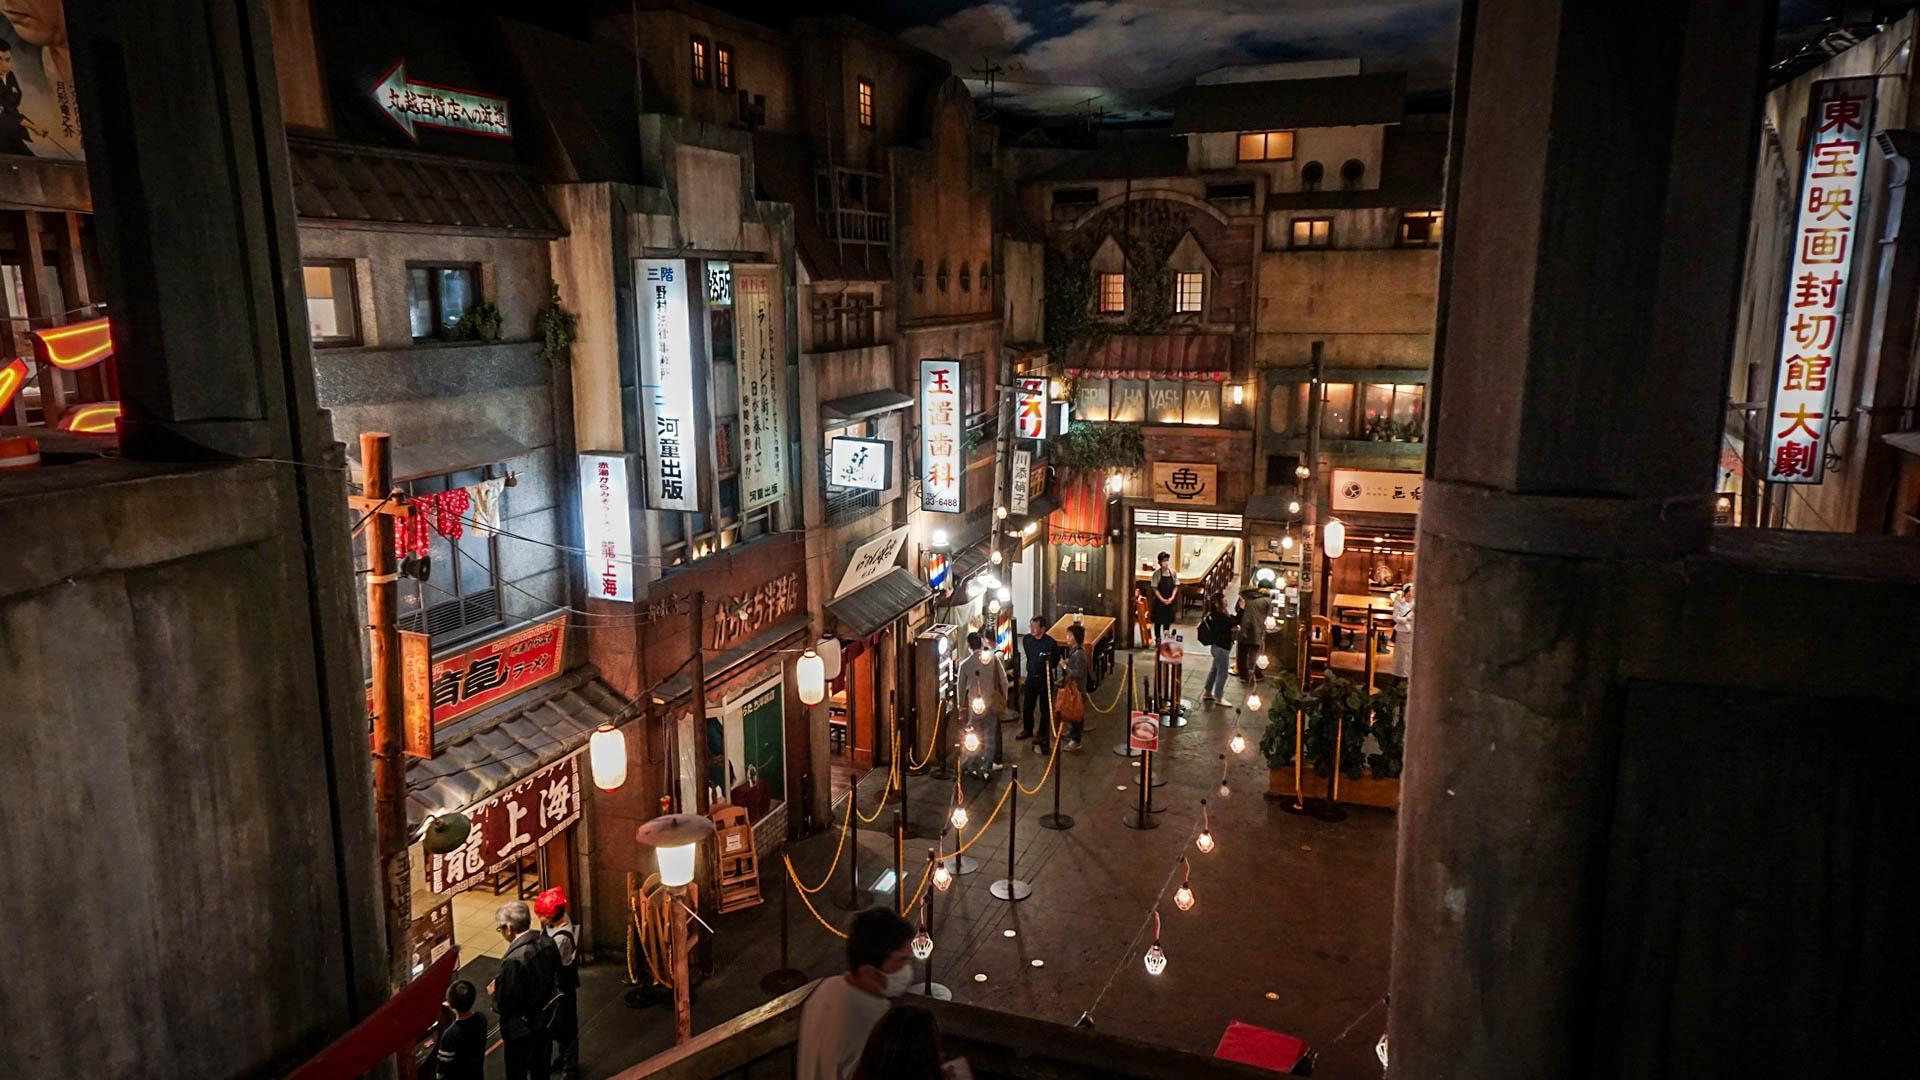 А это - музей рамена. Лапши. Йокогама.